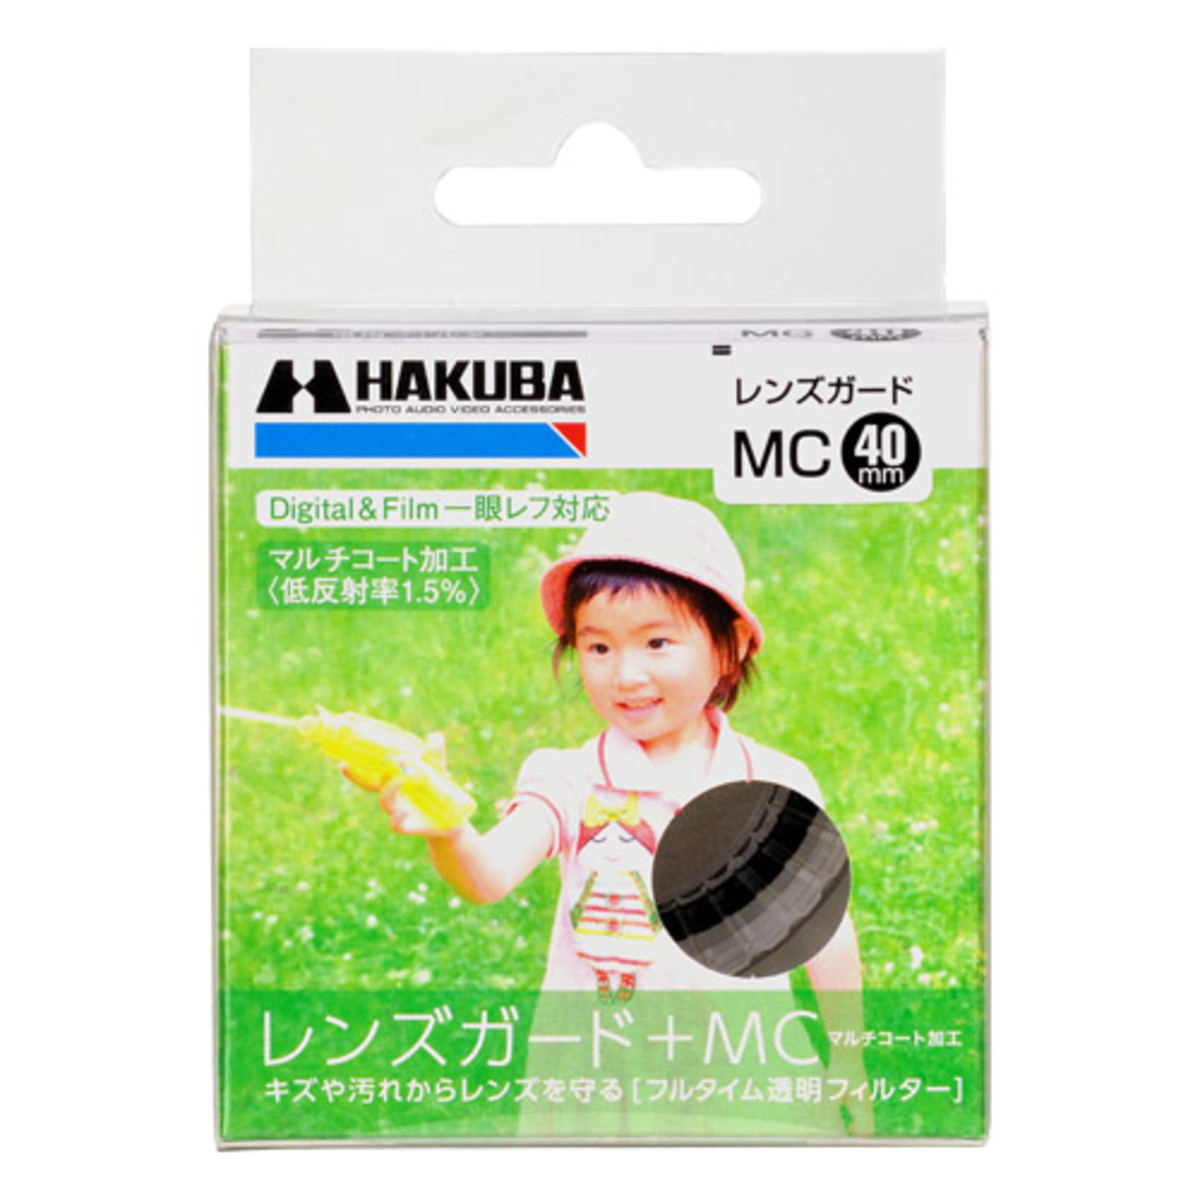 MC UV Protector 62mm Filter 鏡頭保護鏡